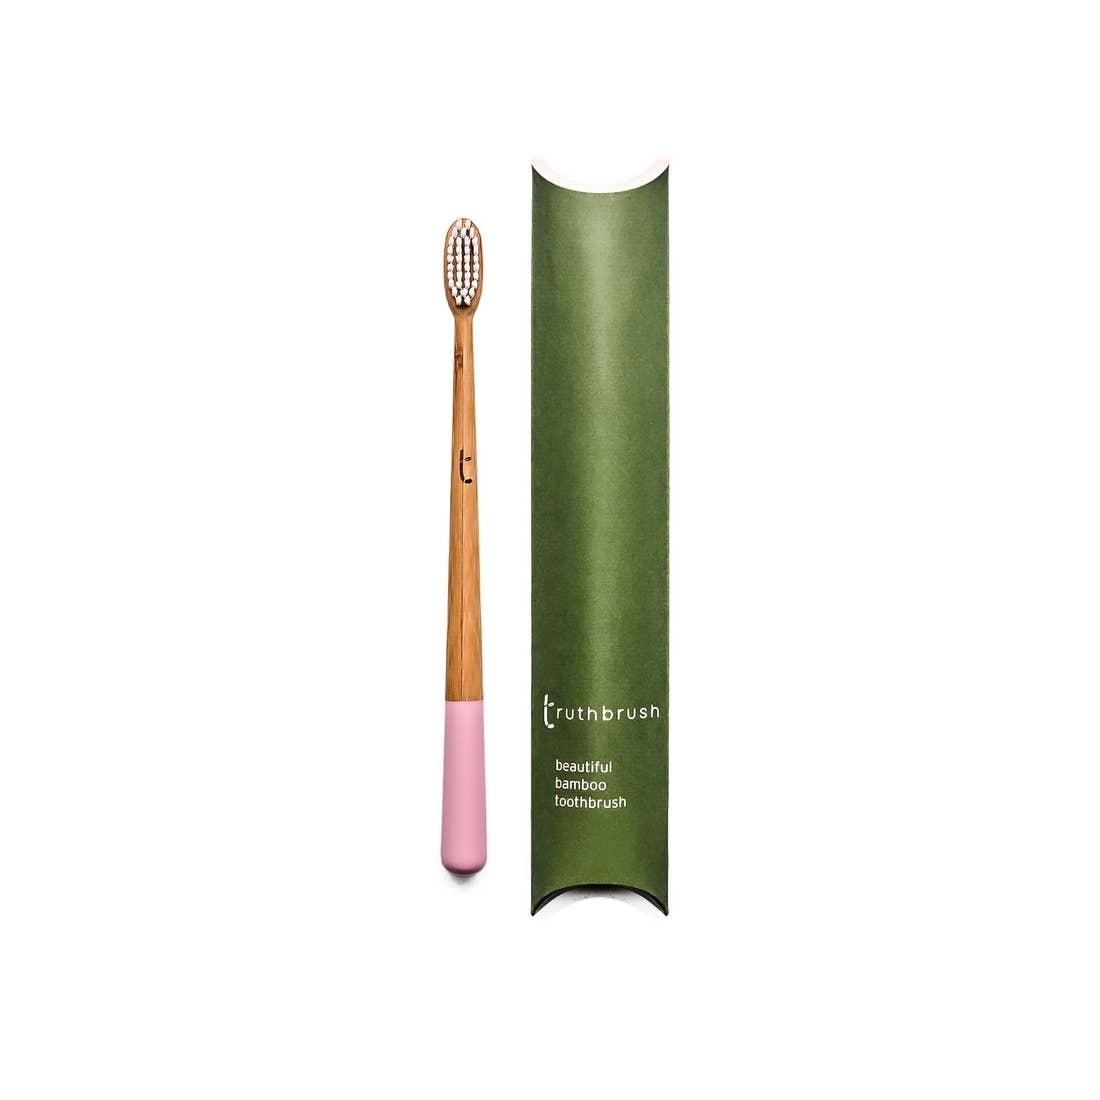 Truthbrush Ltd Bamboo Toothbrush  - Adult Medium Bristle  - Pink